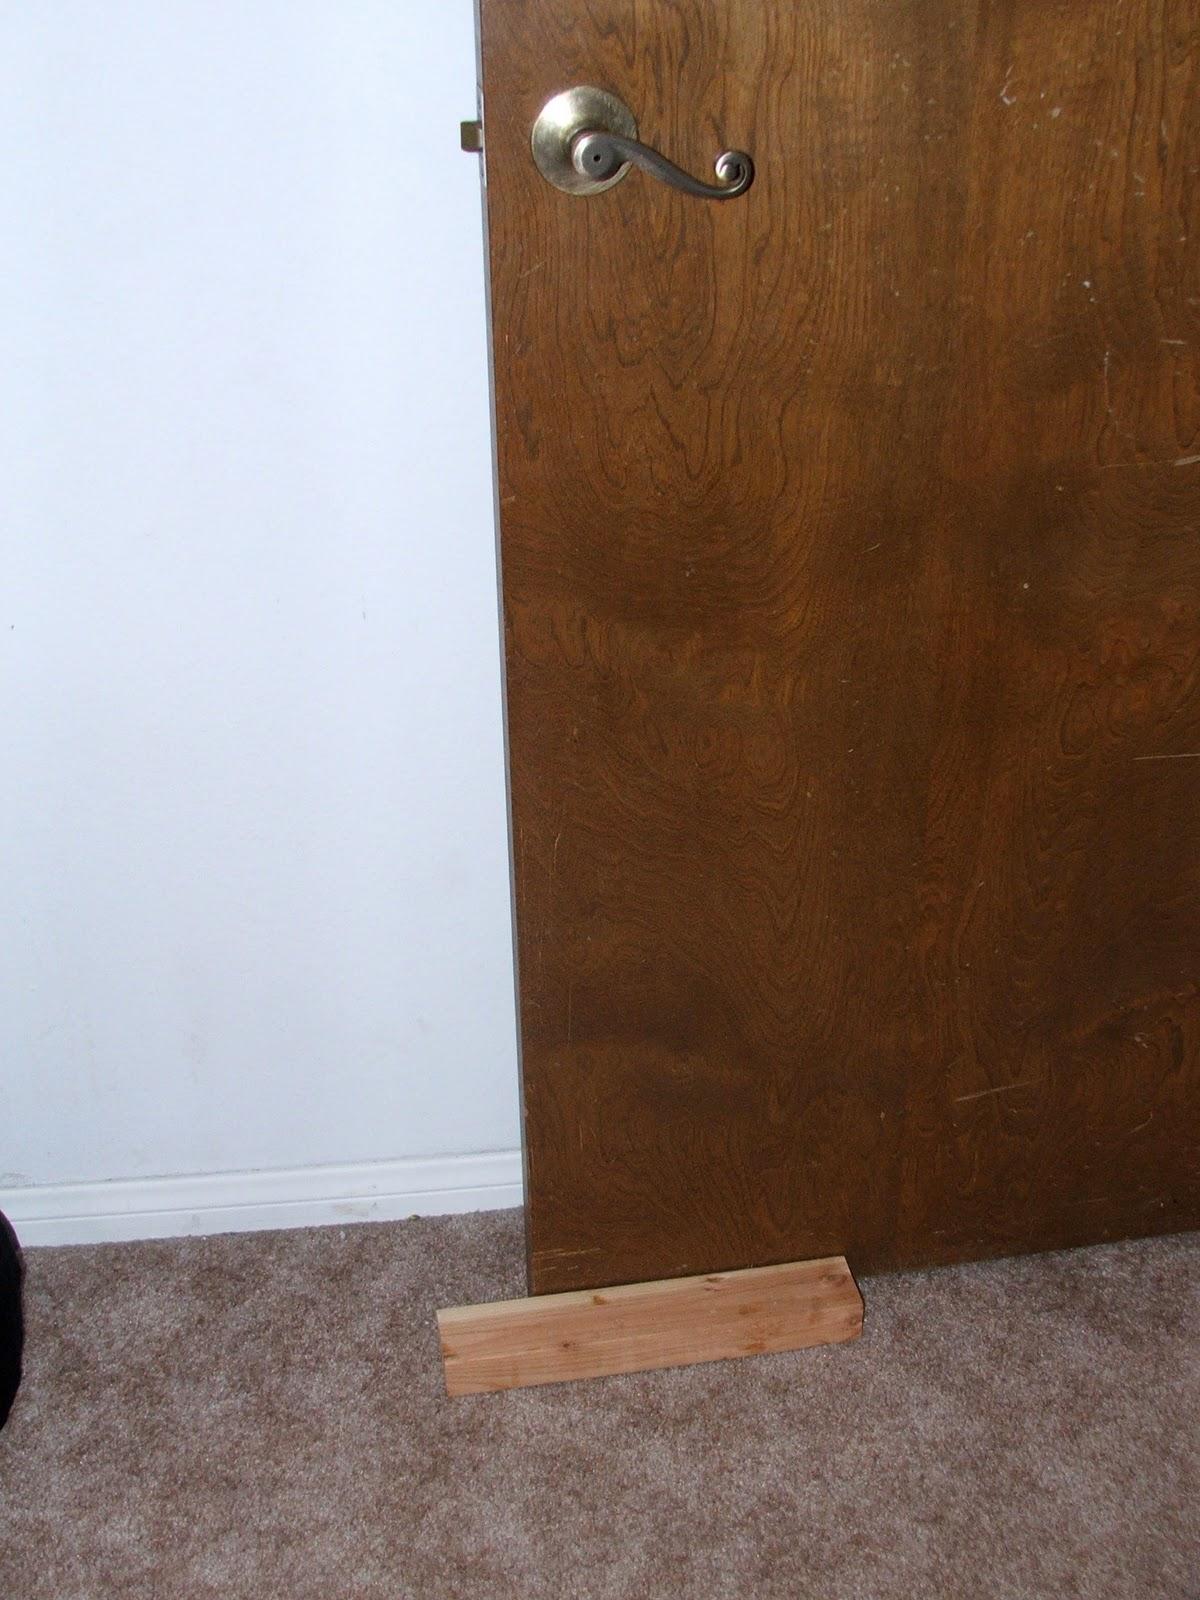 The Crafterbug Decorative Door Stop